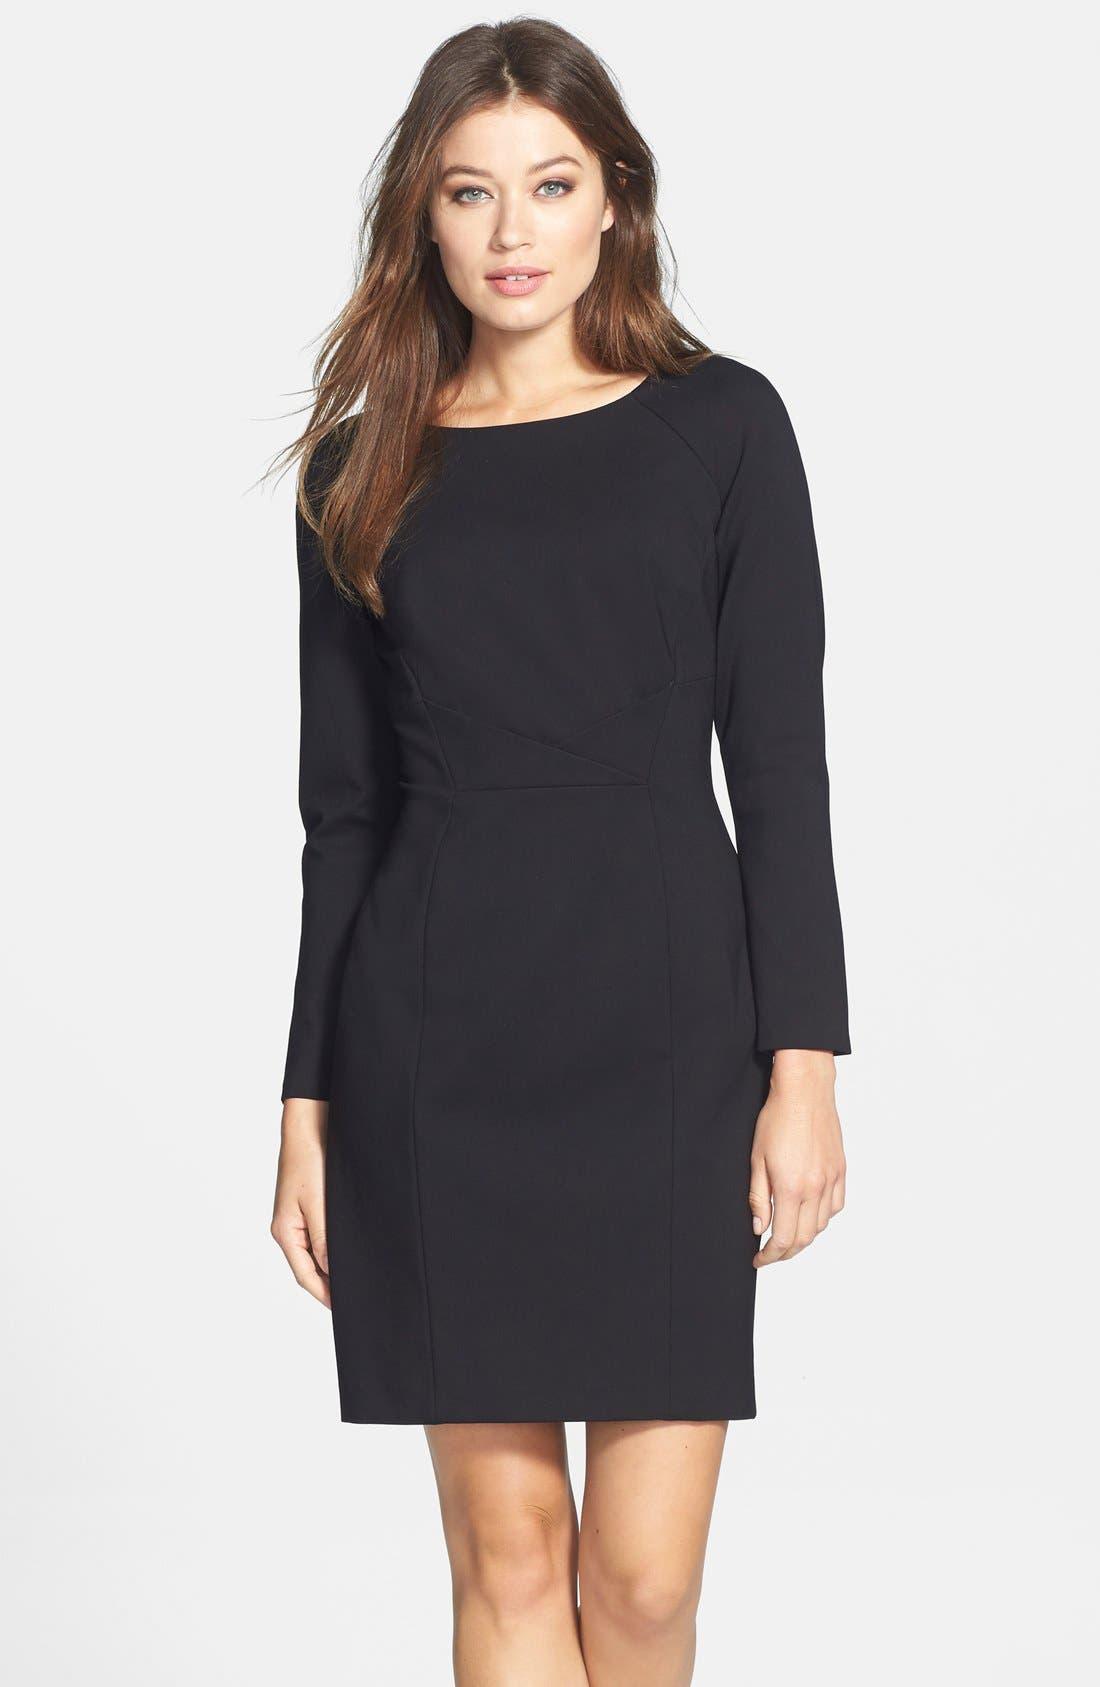 TAHARI, Pleat Detail Long Sleeve Ponte Sheath Dress, Main thumbnail 1, color, 001